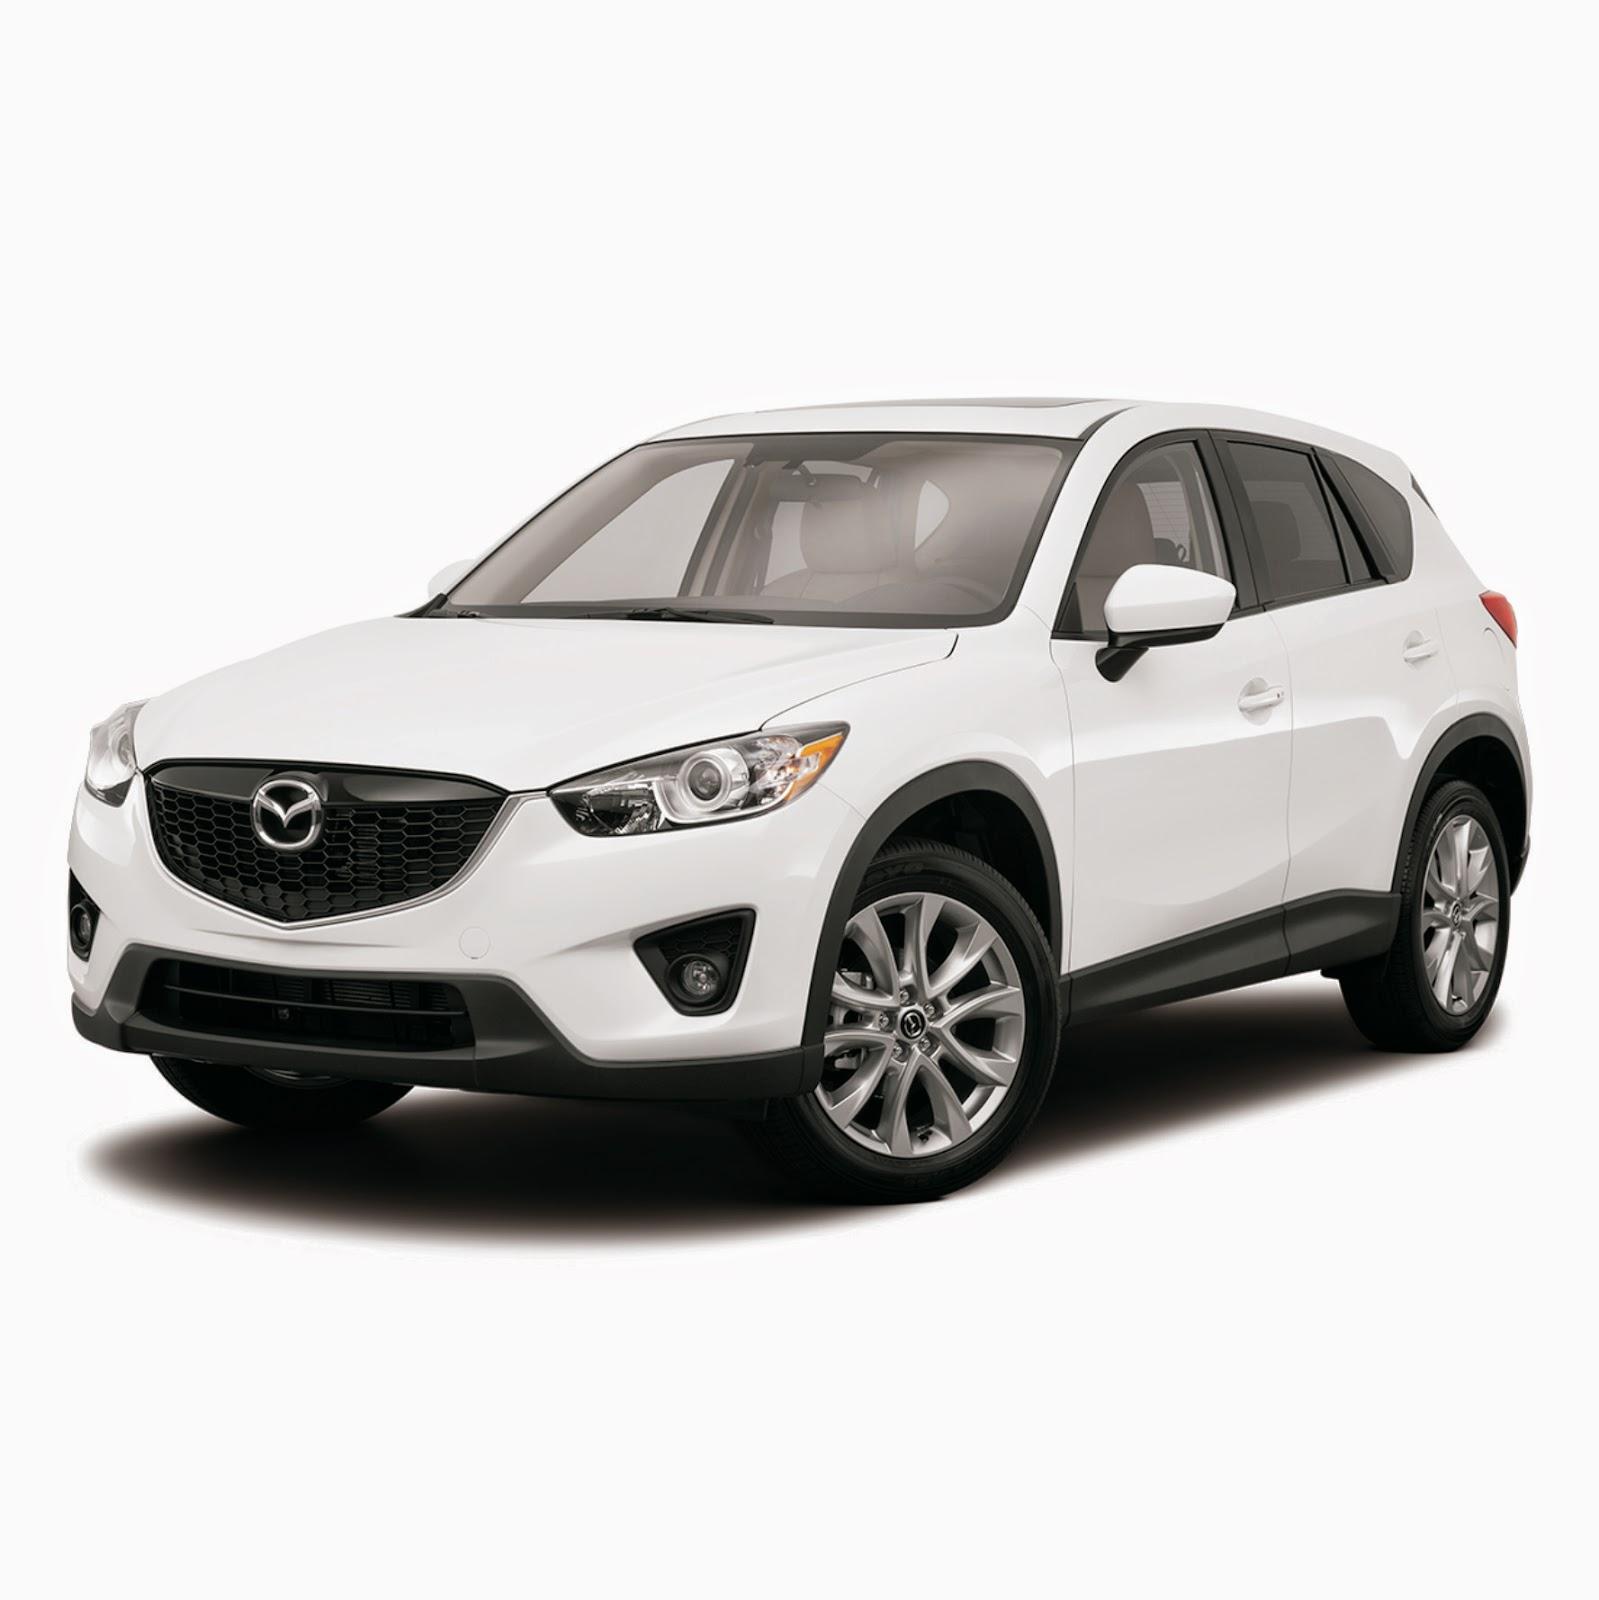 Mazda CX5| Ảnh xe mazda CX5| Ảnh đẹp xe Mazda CX5